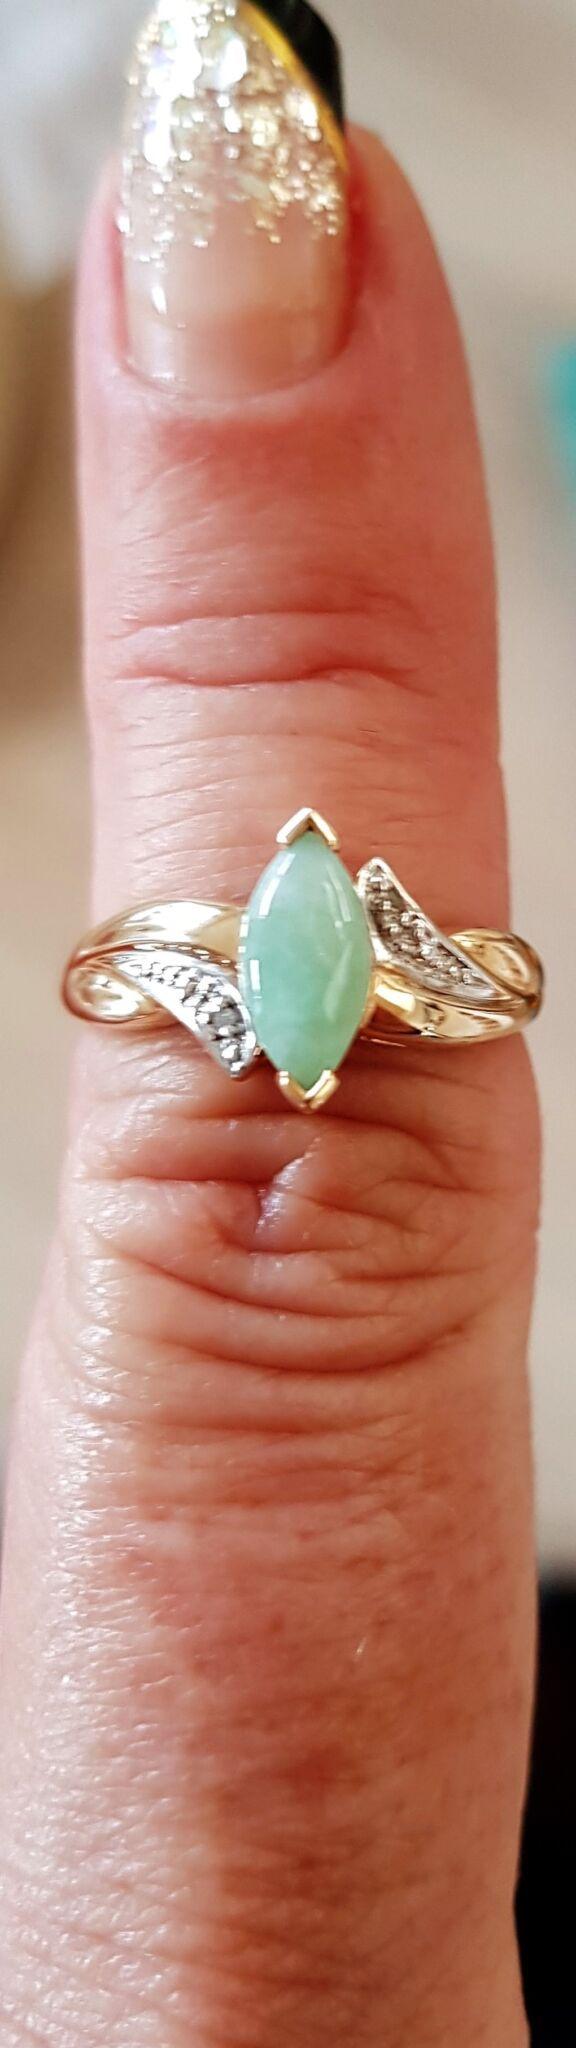 14 Karat Guld ring m. Marquise Slebet Grøn Jade.